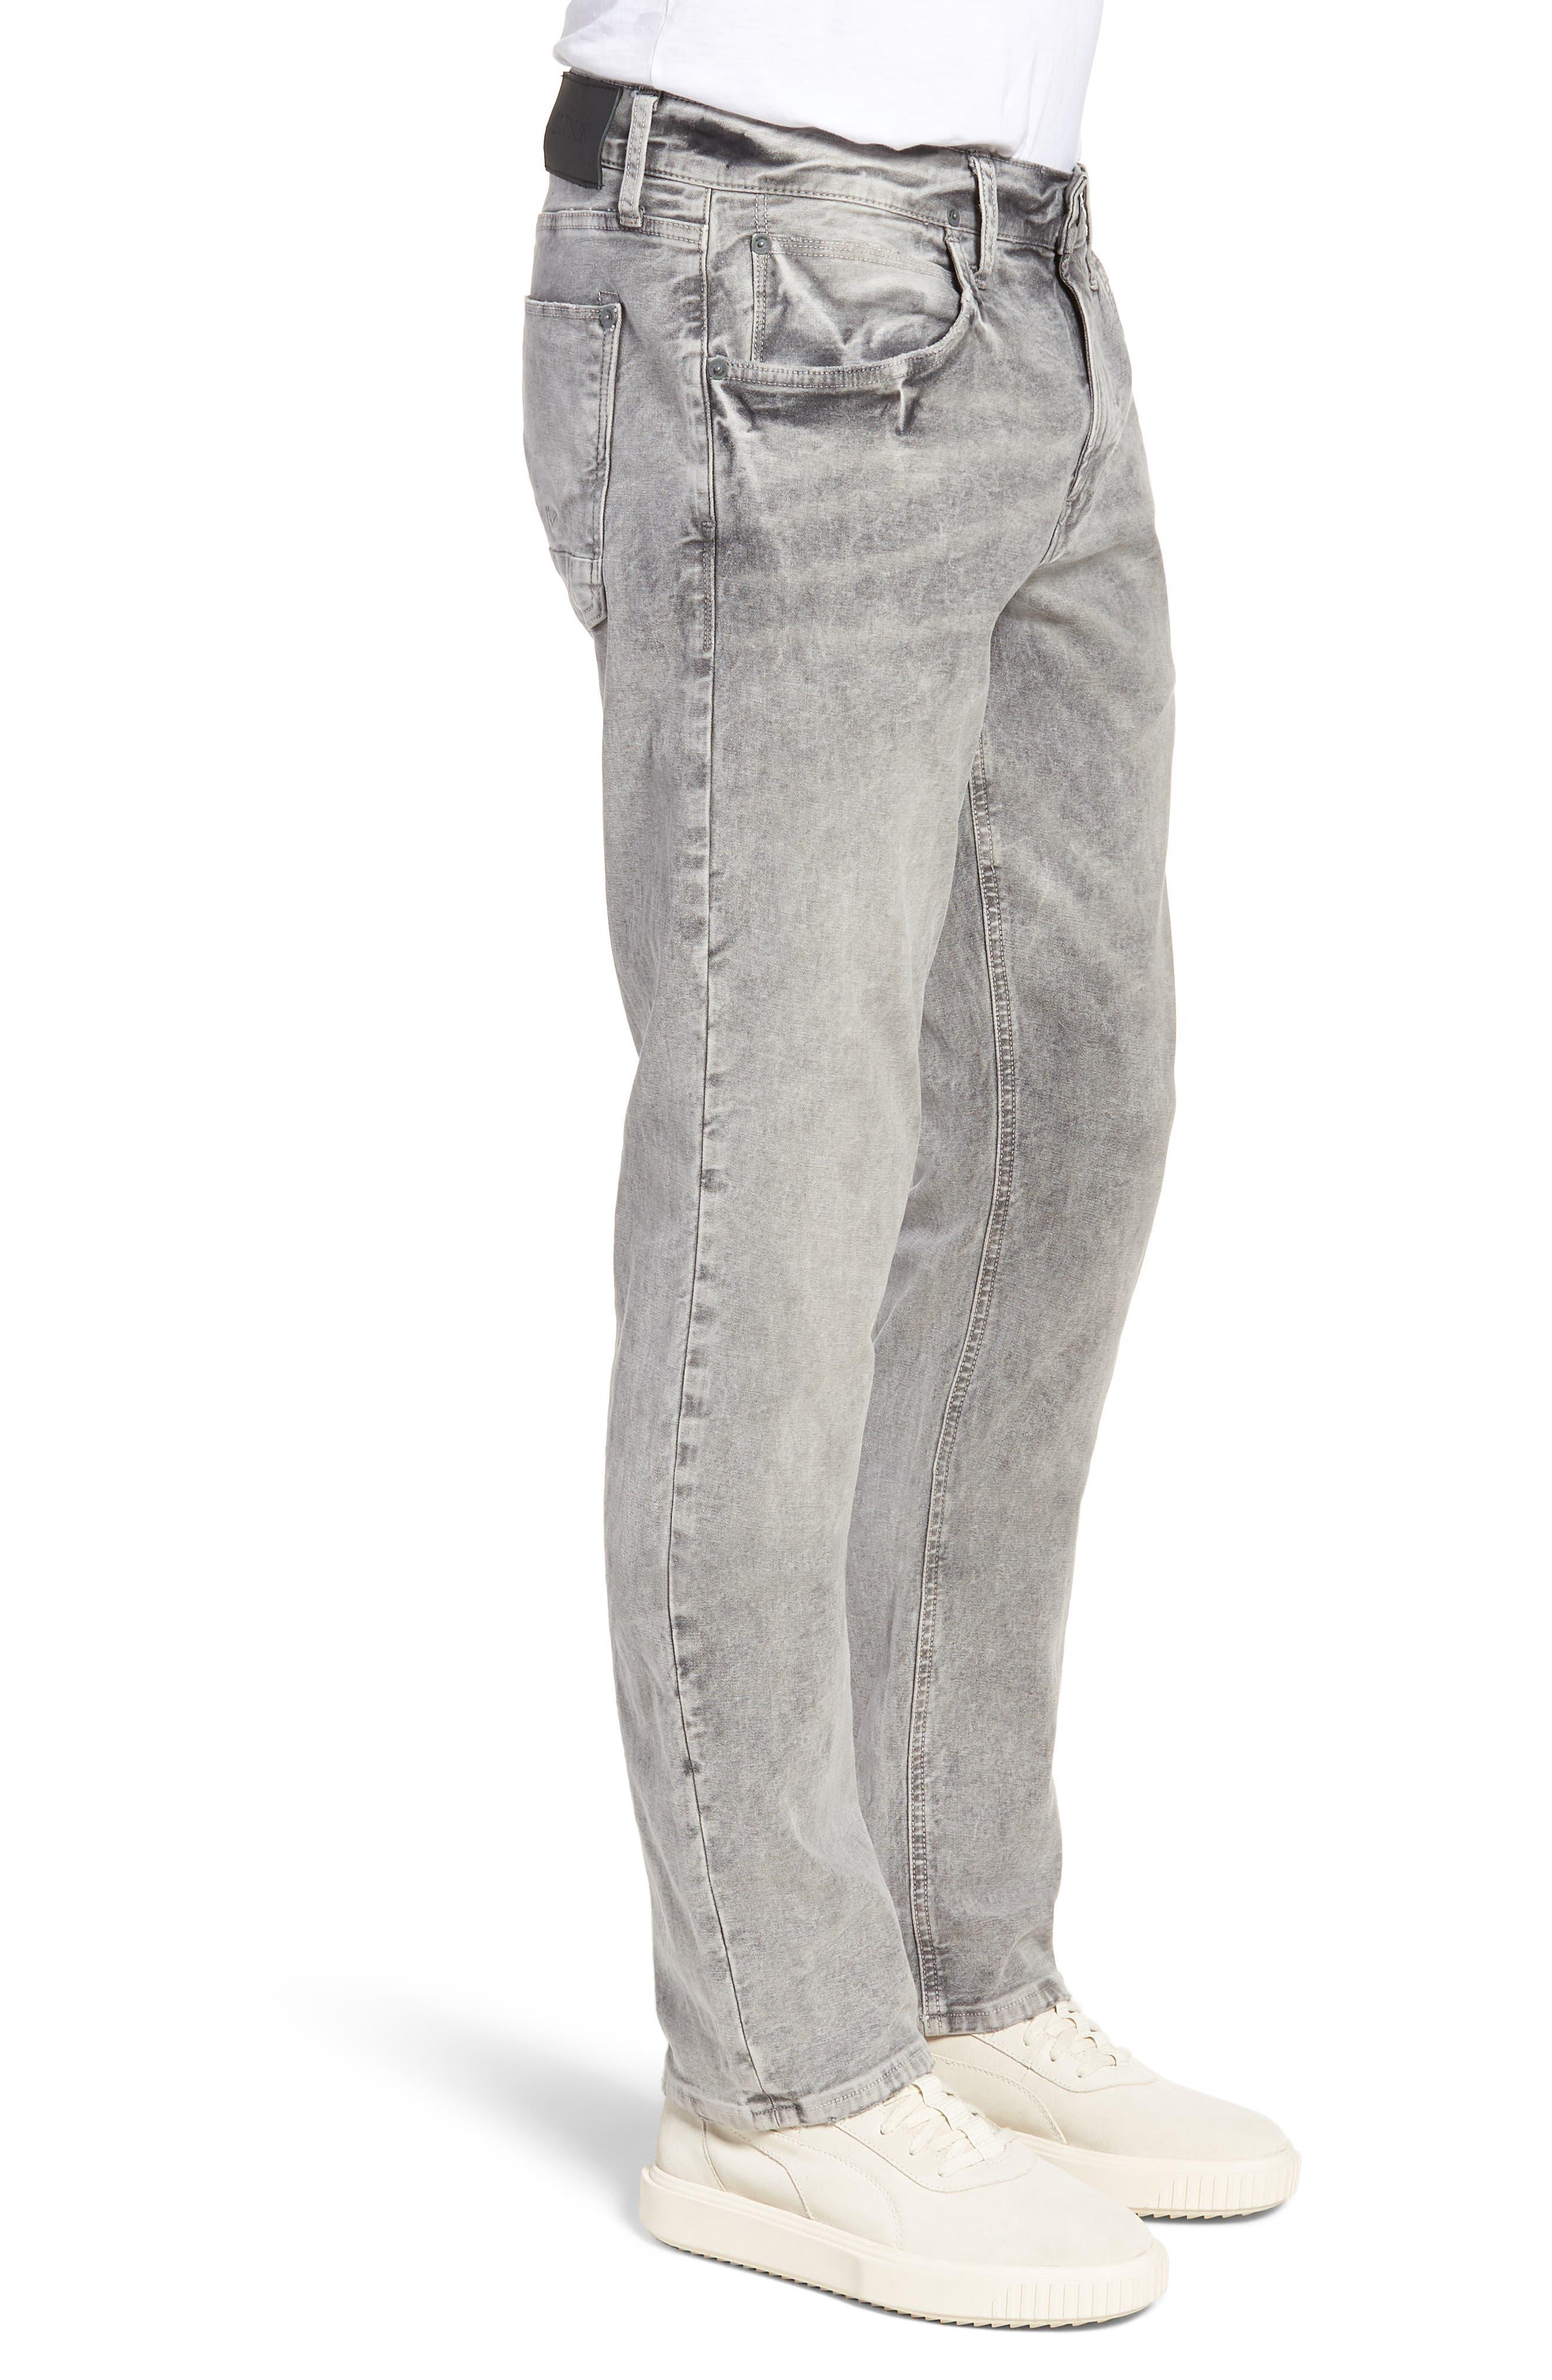 Blake Slim Fit Jeans,                             Alternate thumbnail 3, color,                             063